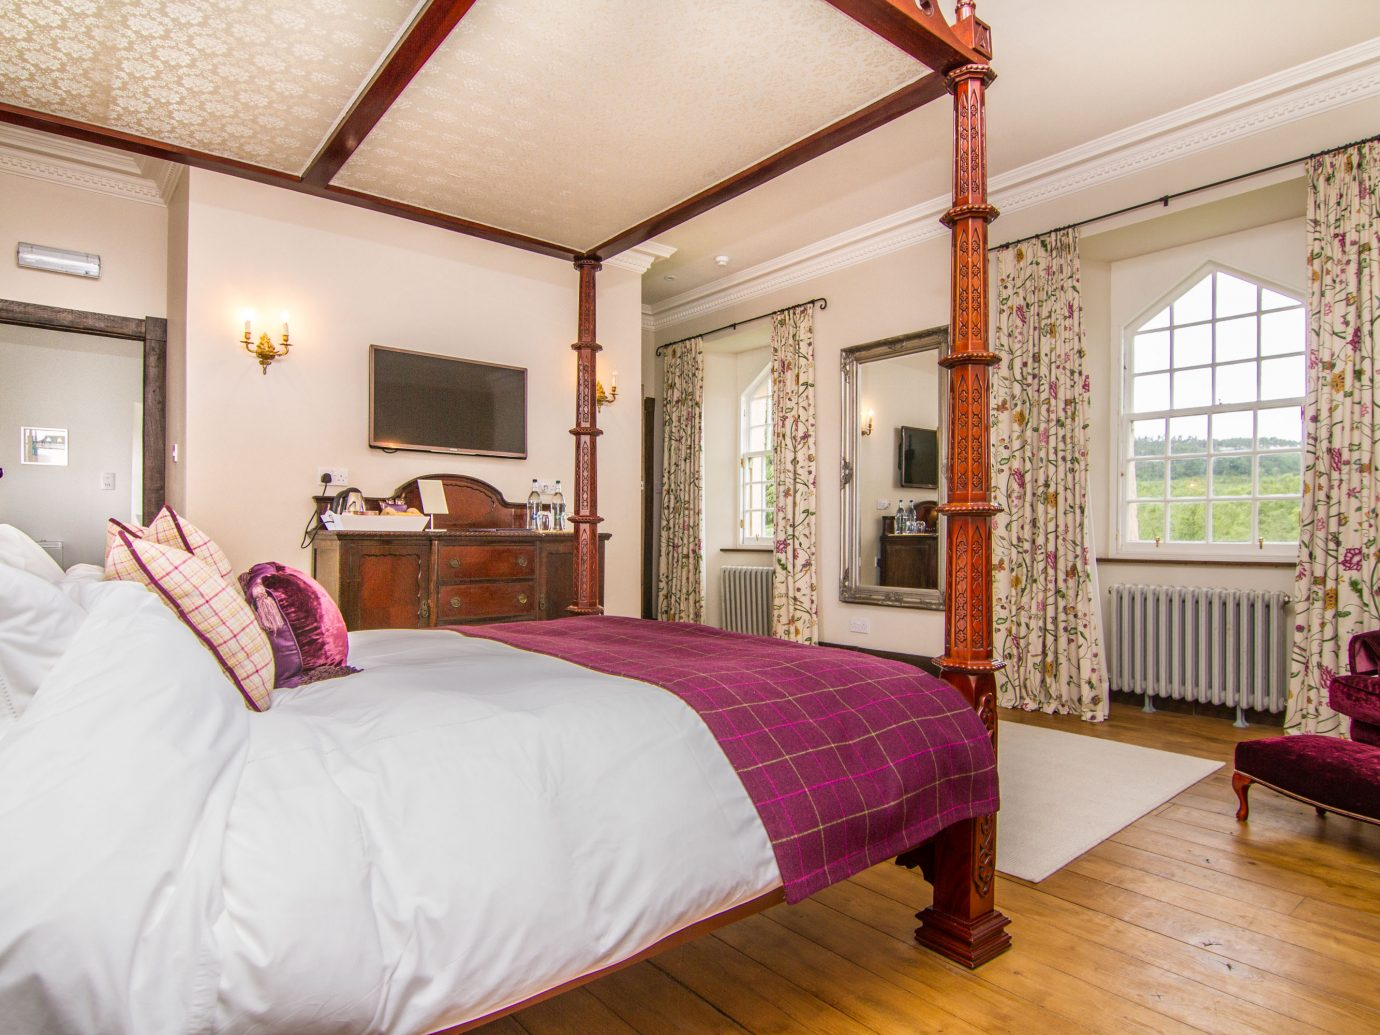 Honeymoon room at Duchray Castle in Scotland